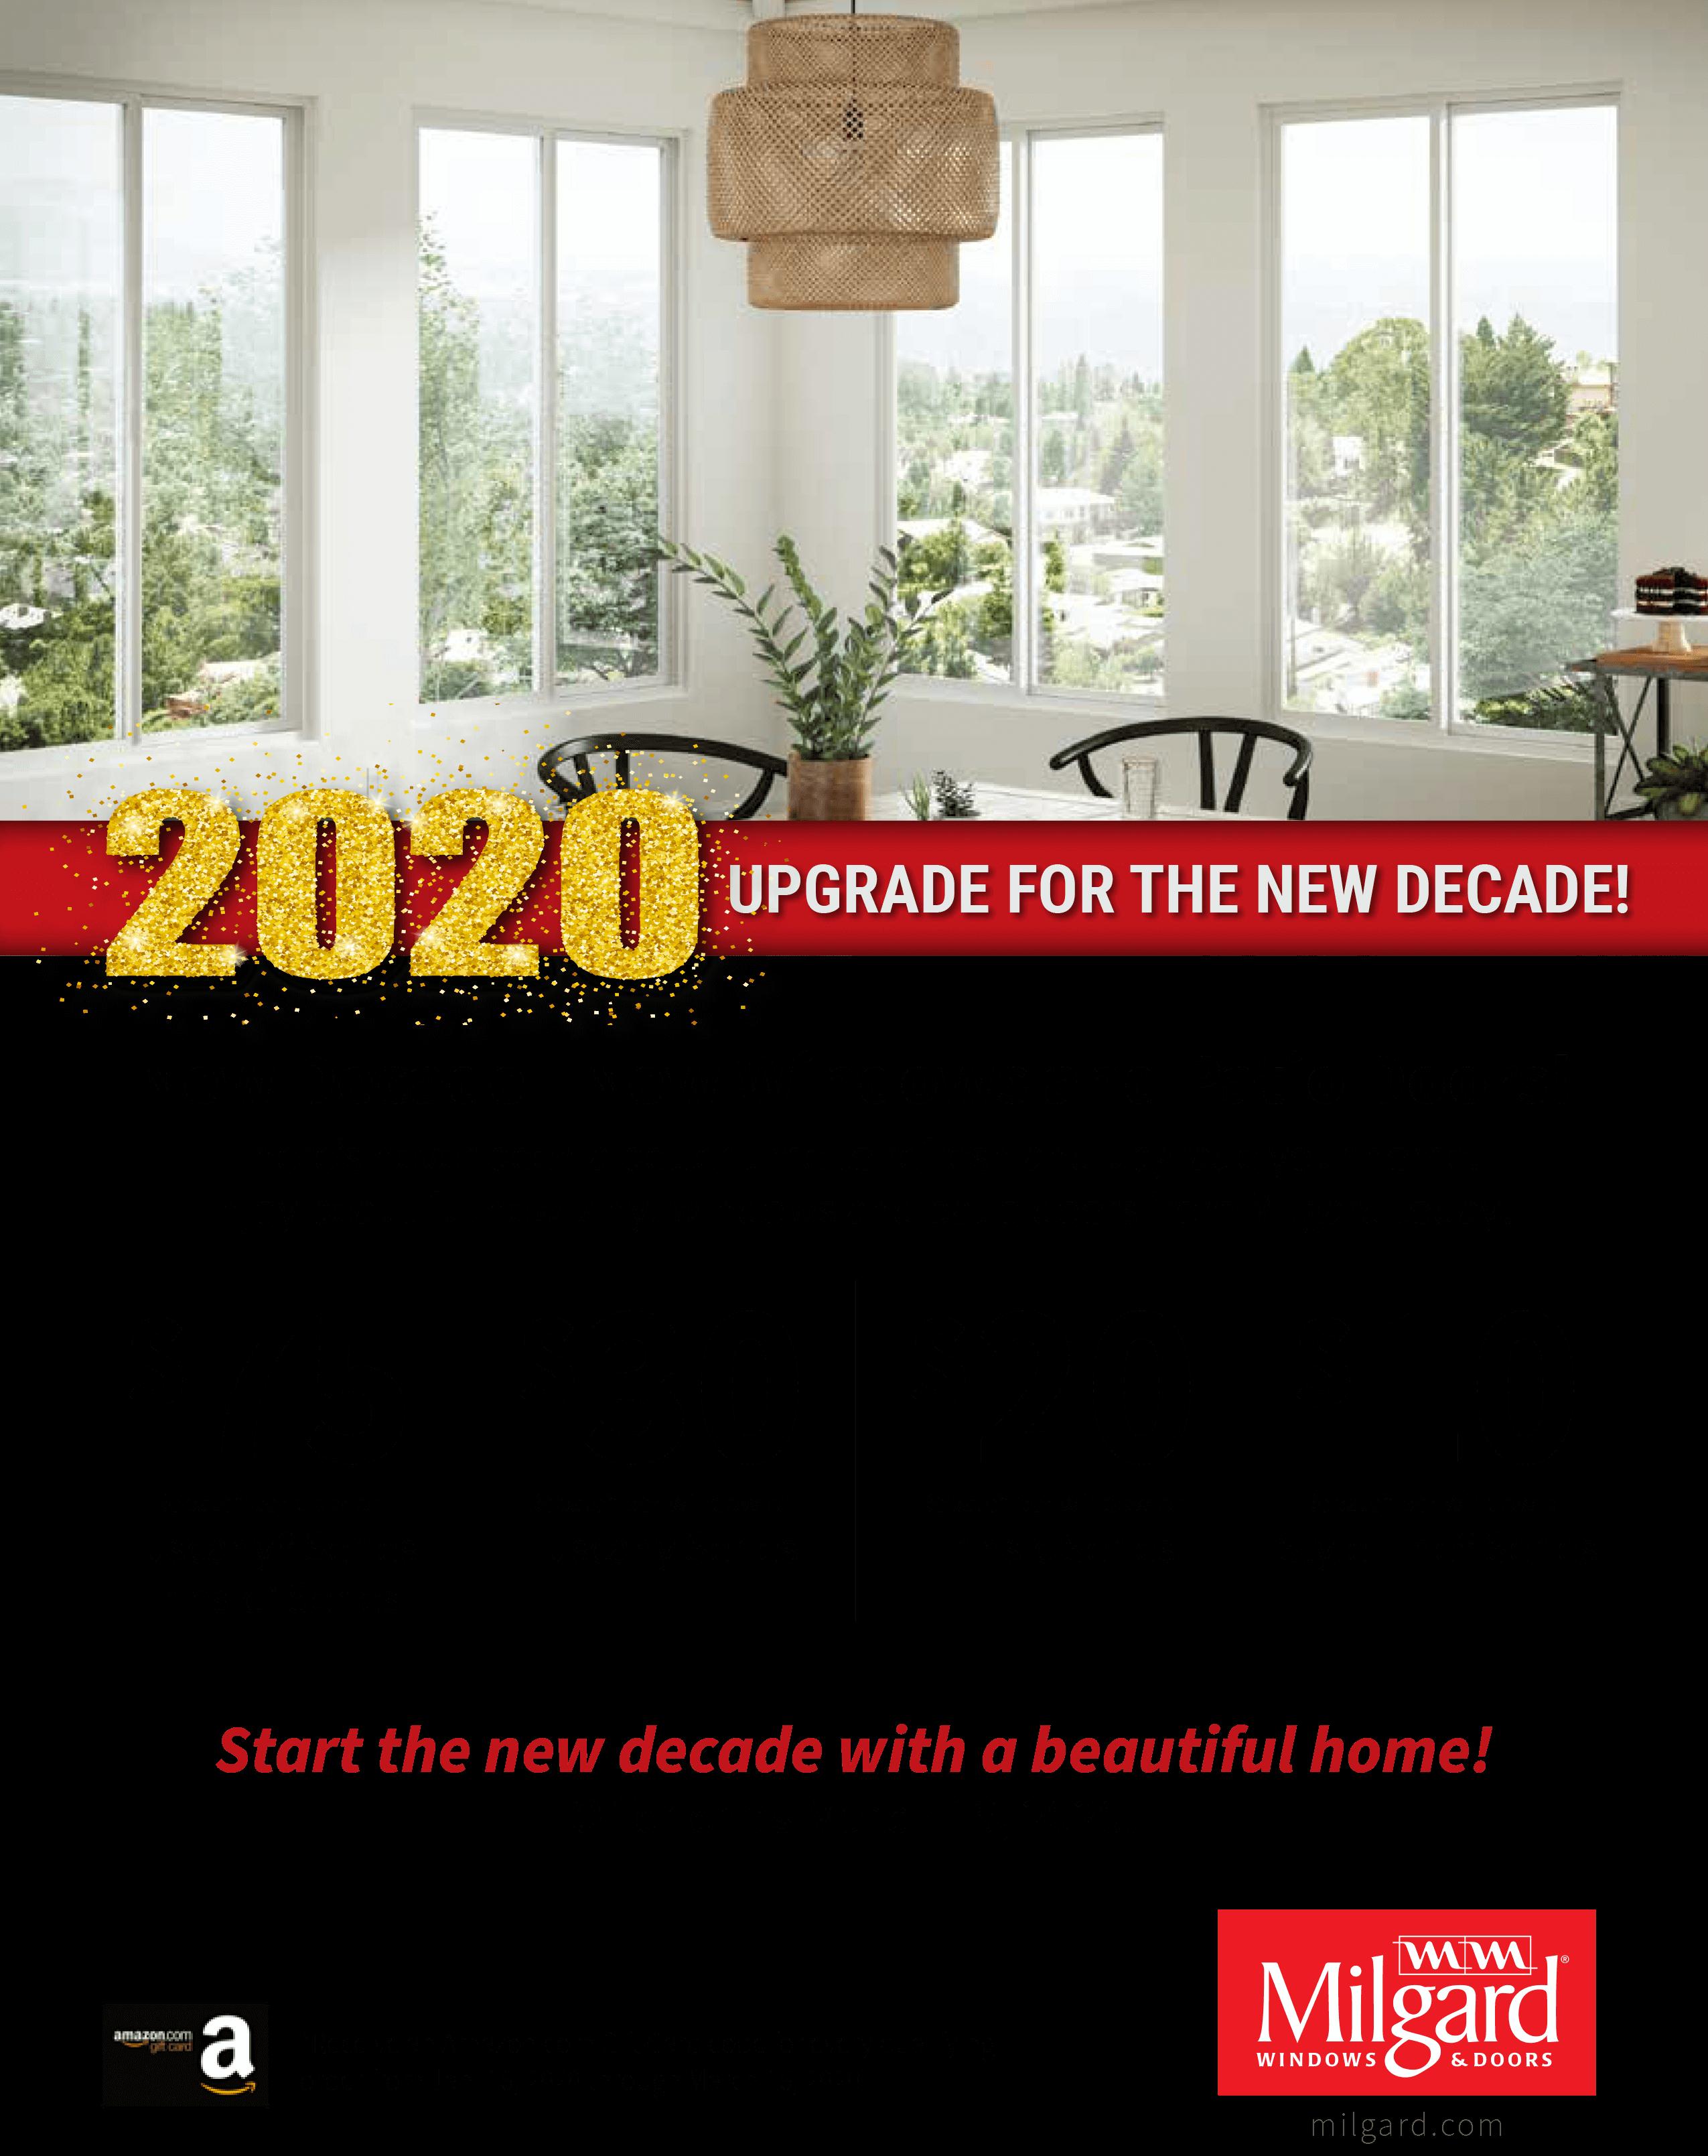 2020Q1 New Decade Promo FLYER 1